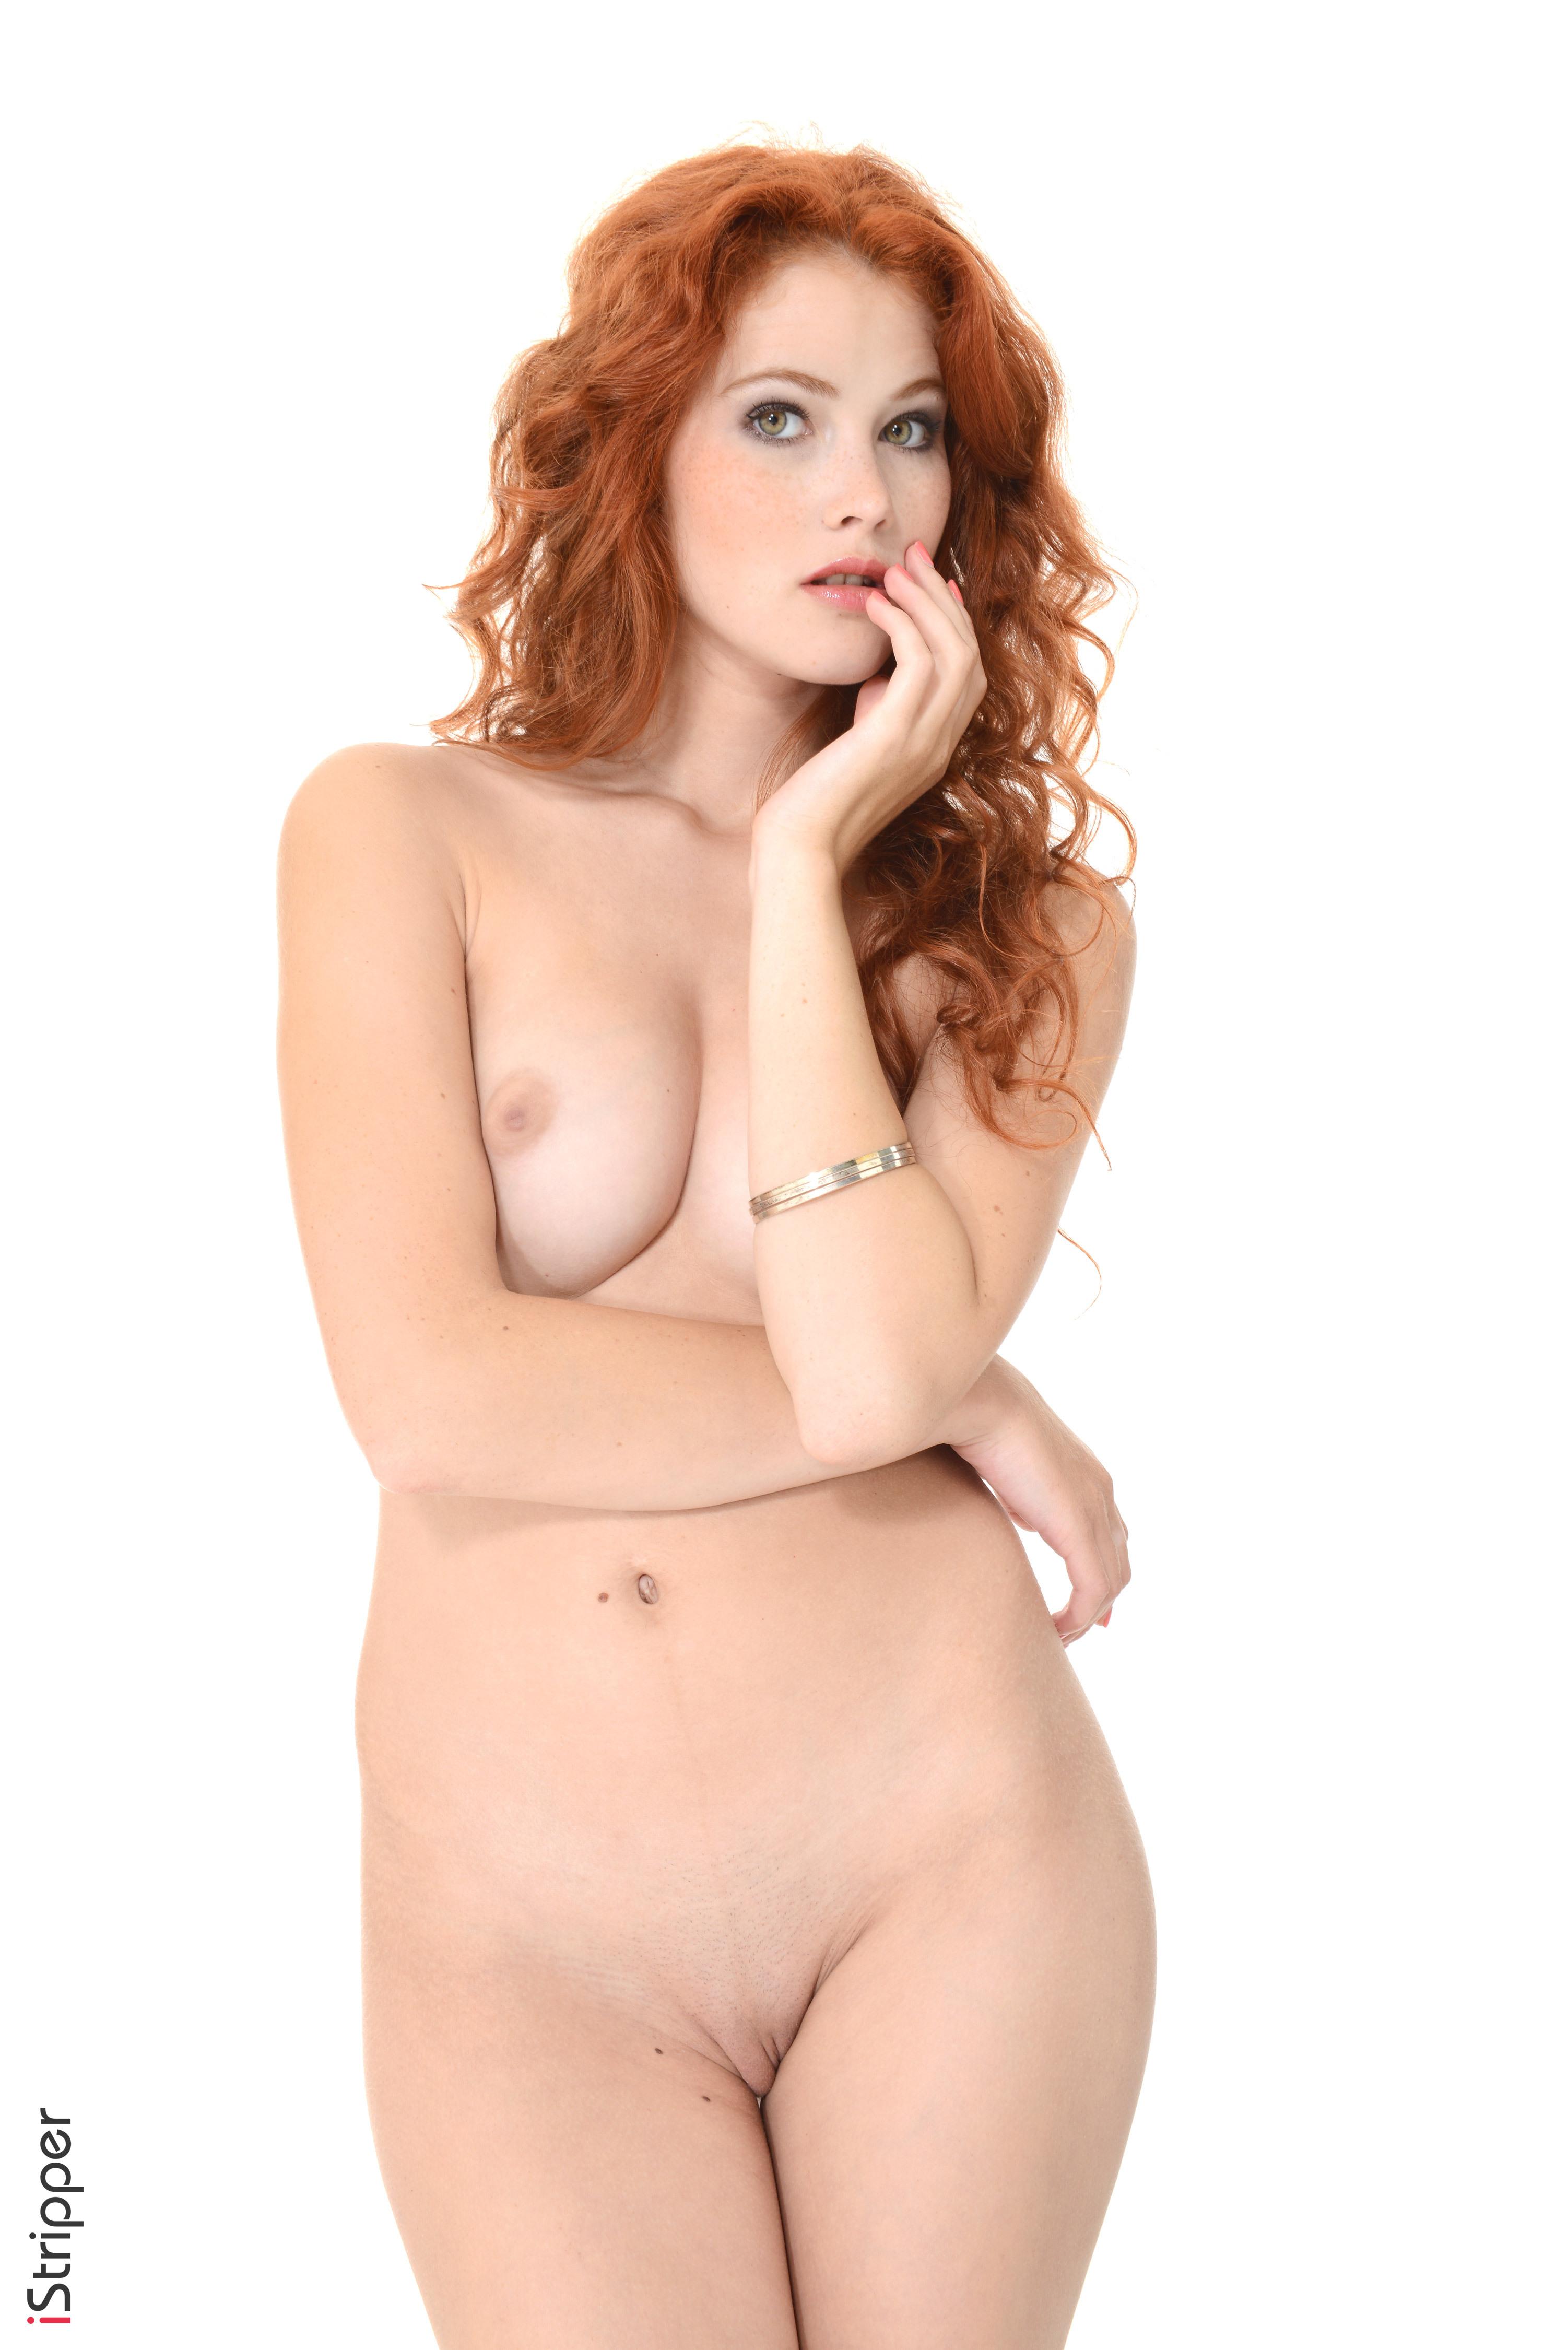 sexy girls walls